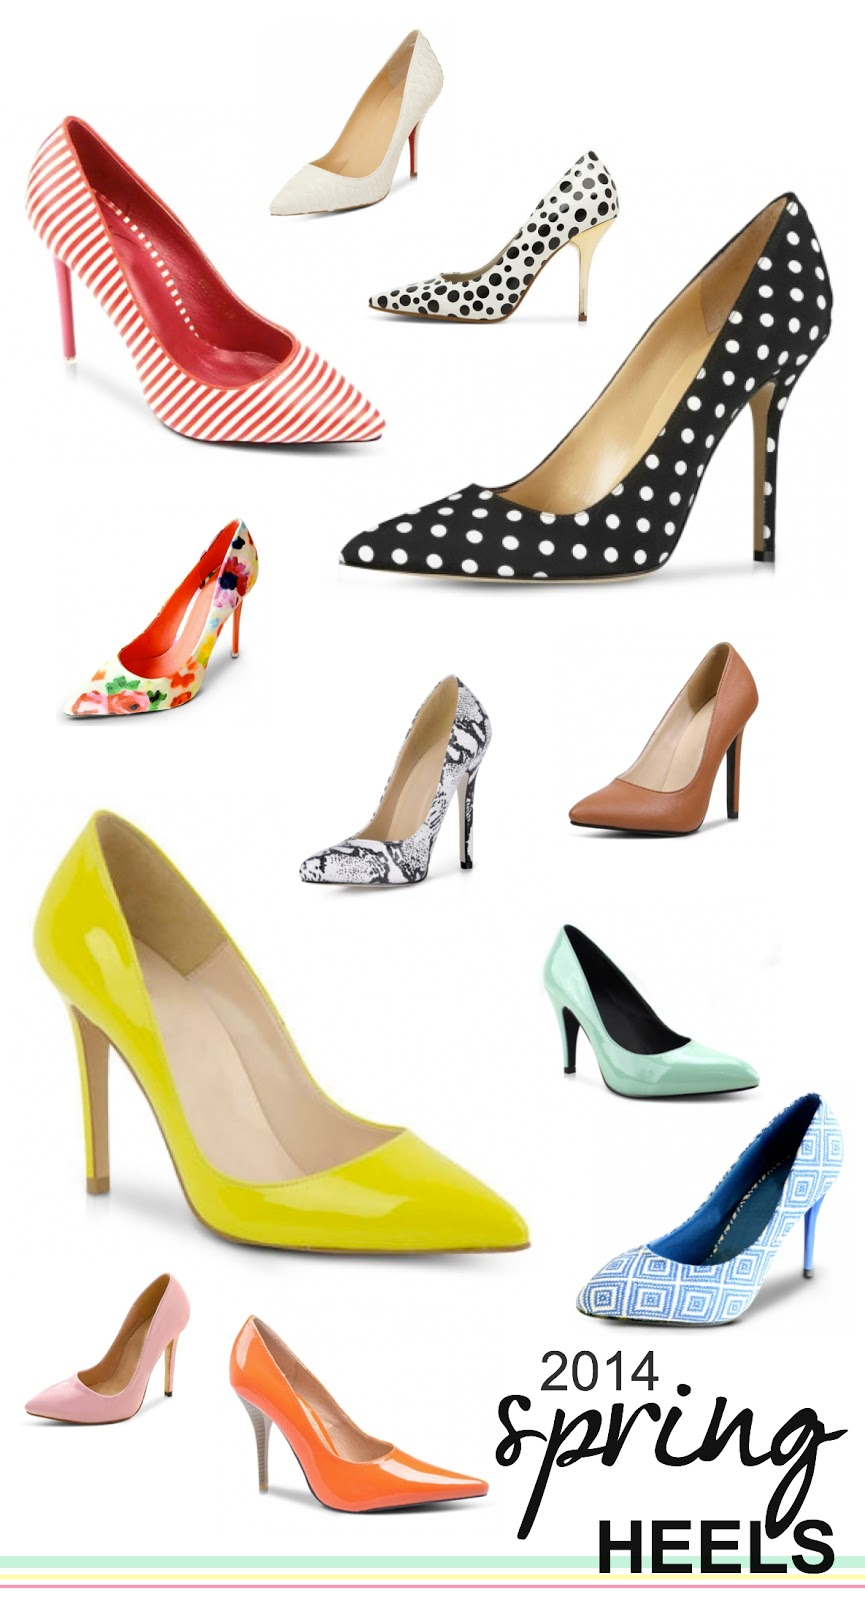 15 Heels For Spring 2014 Elisabeth Mcknight